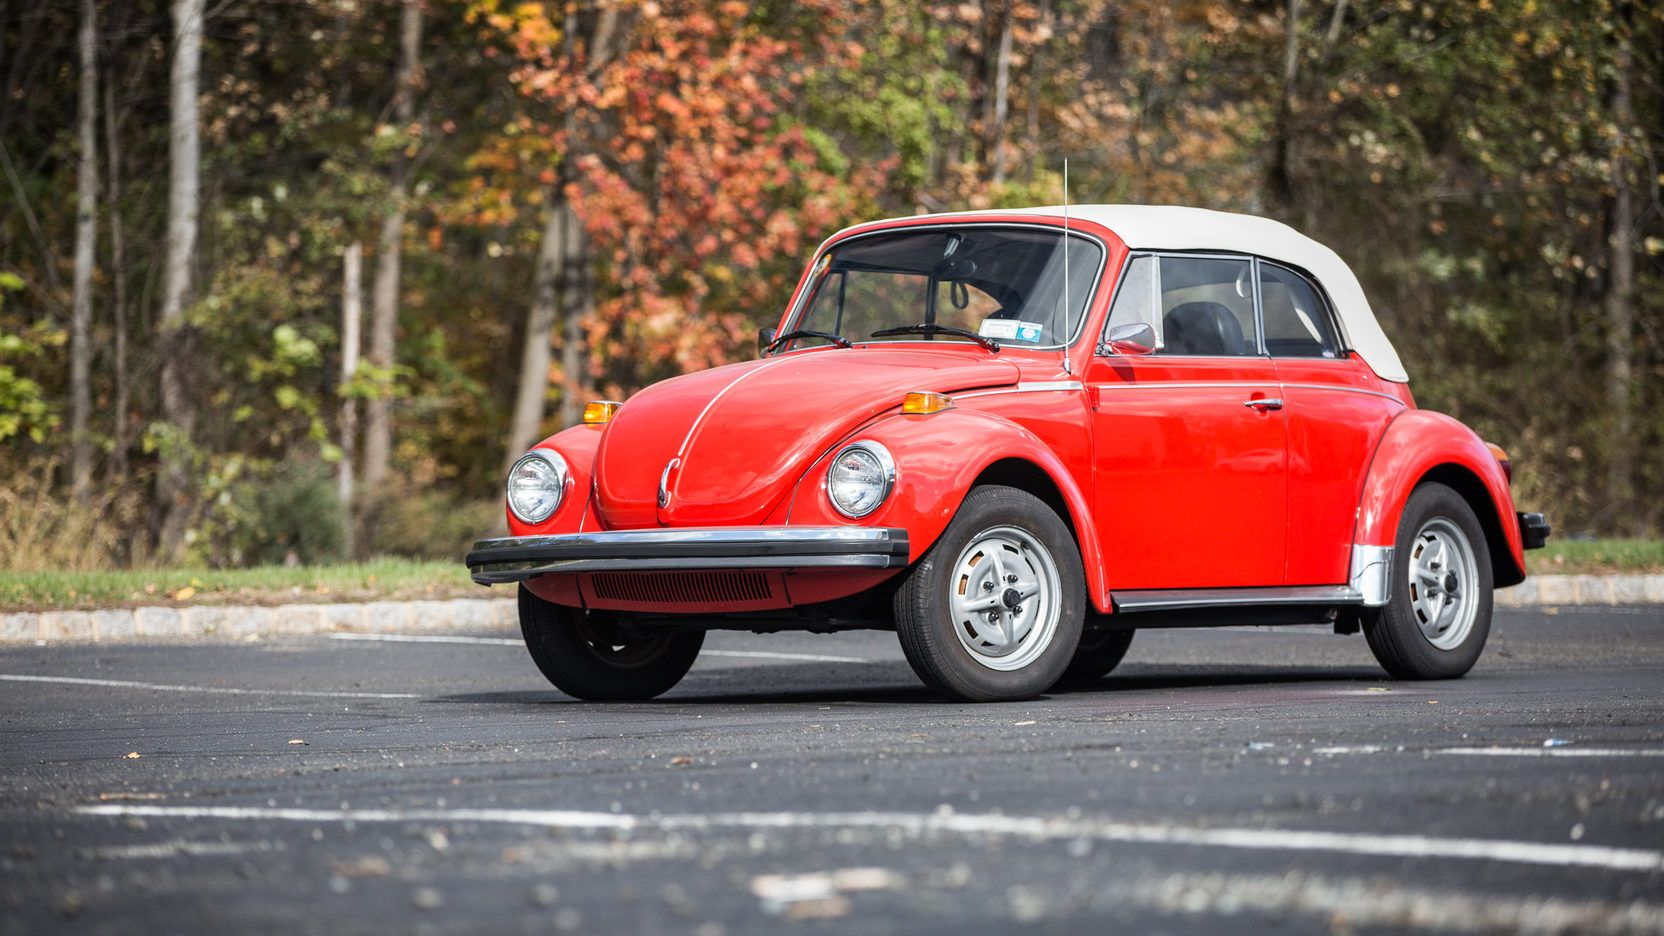 1979 Volkswagen Super Beetle Convertible presented as Lot